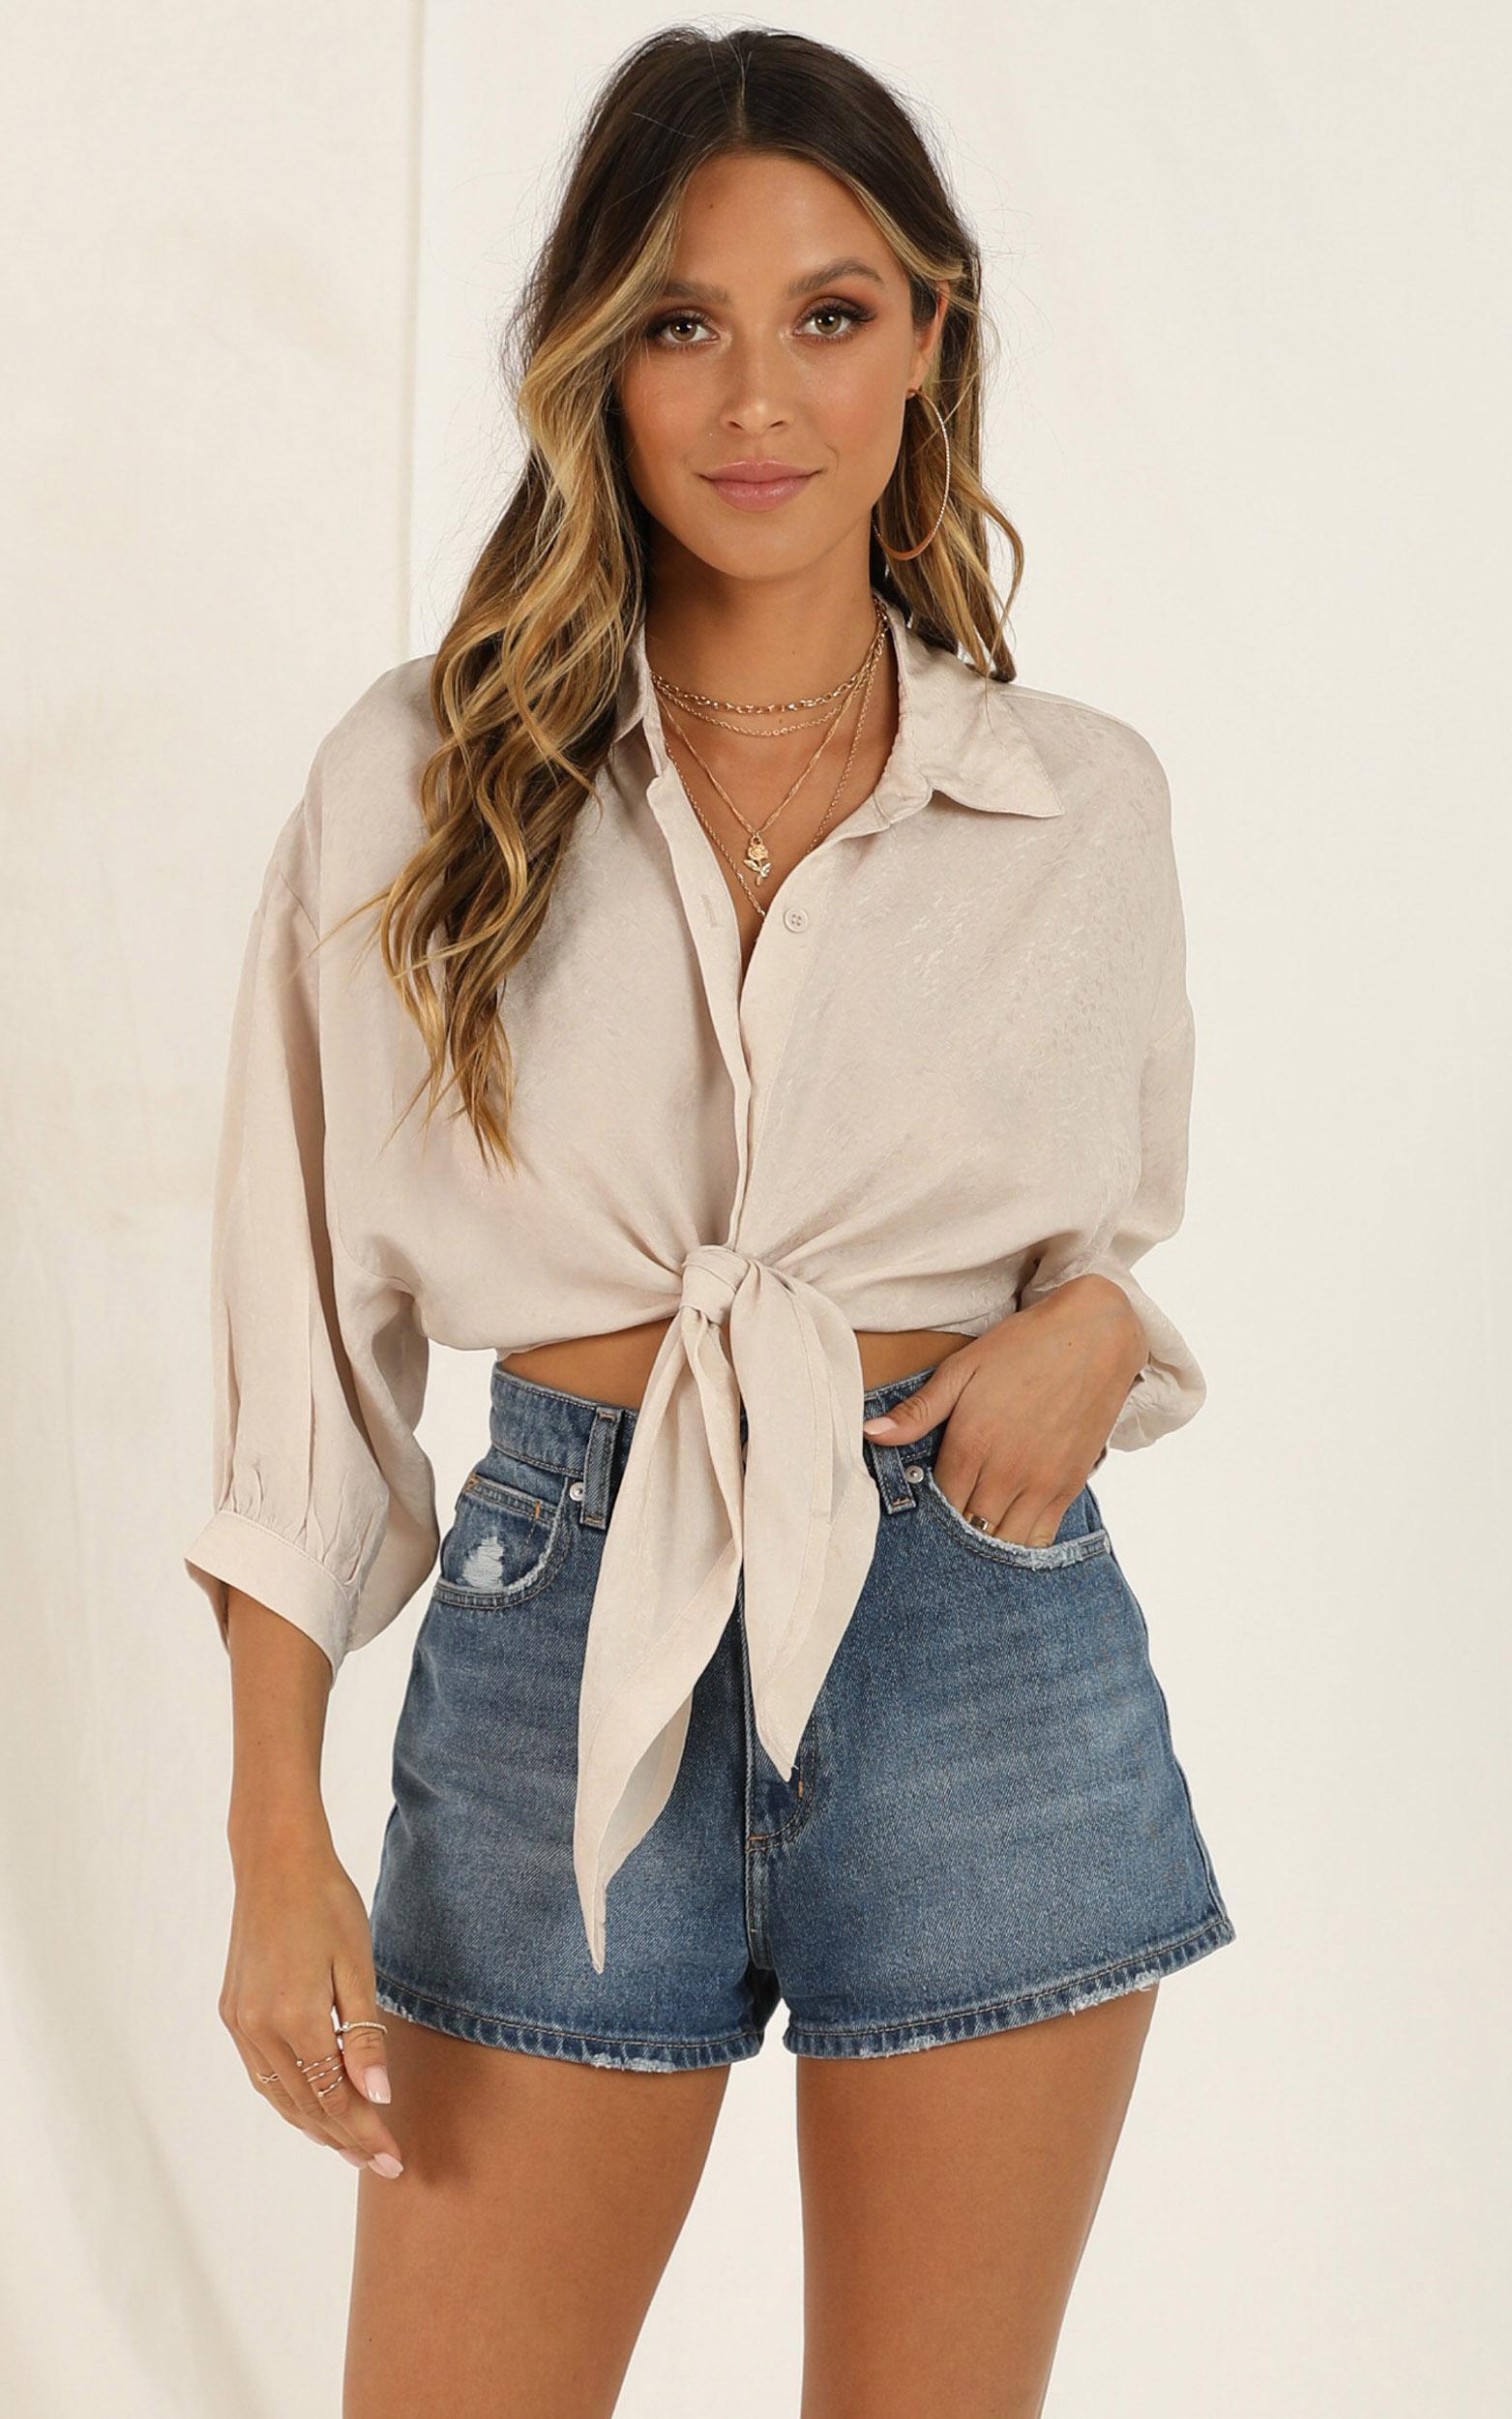 Youre Gone shirt in beige - 12 (L), Beige, hi-res image number null